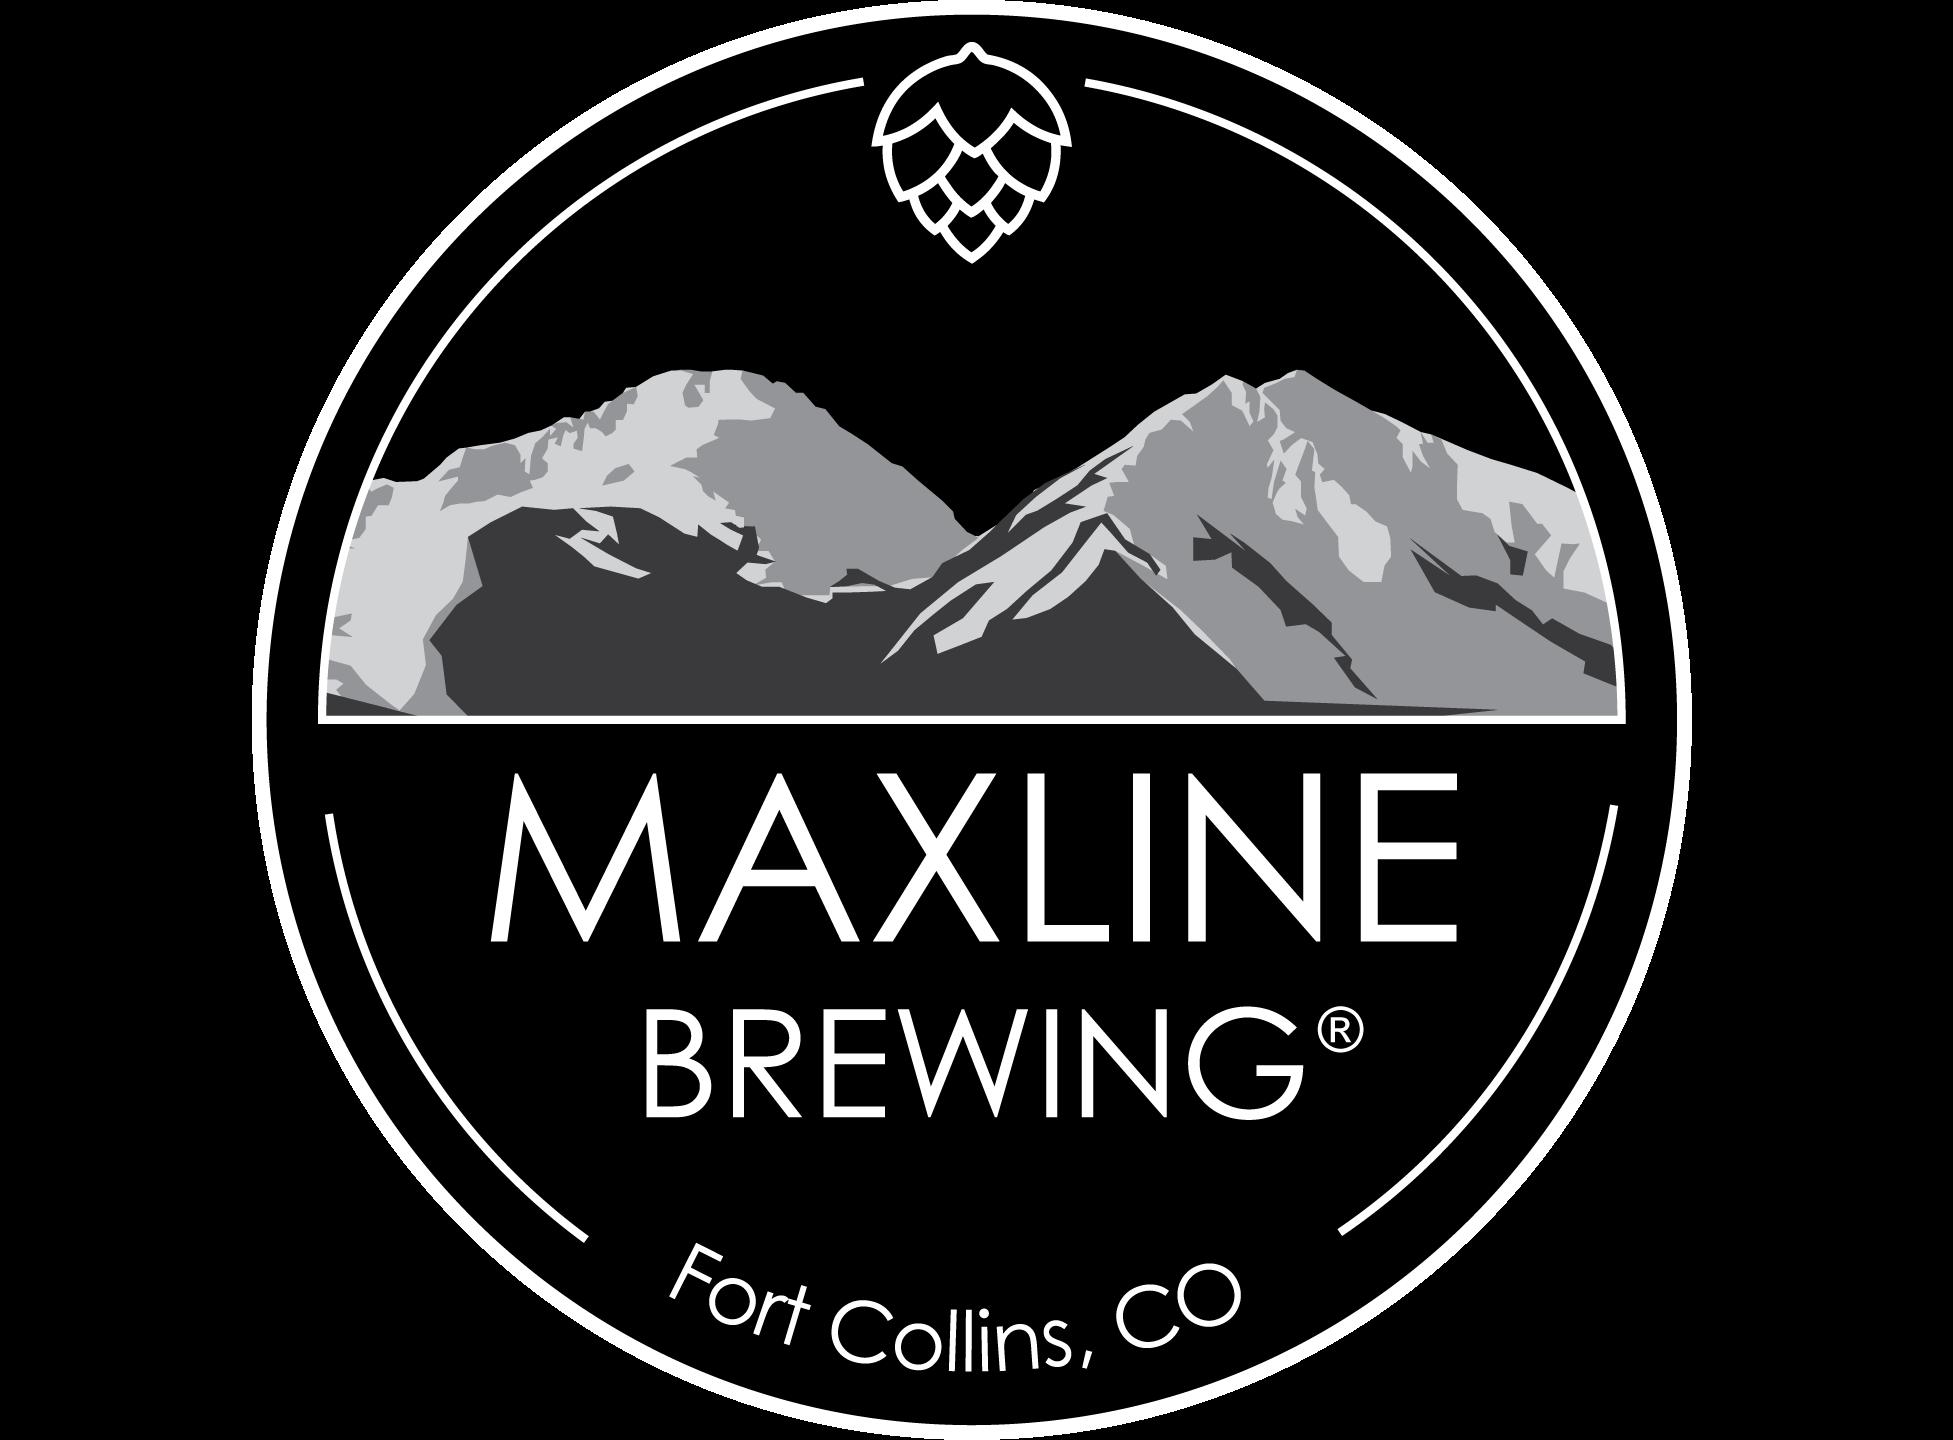 Farmhouse Dipa Maxline Brewing